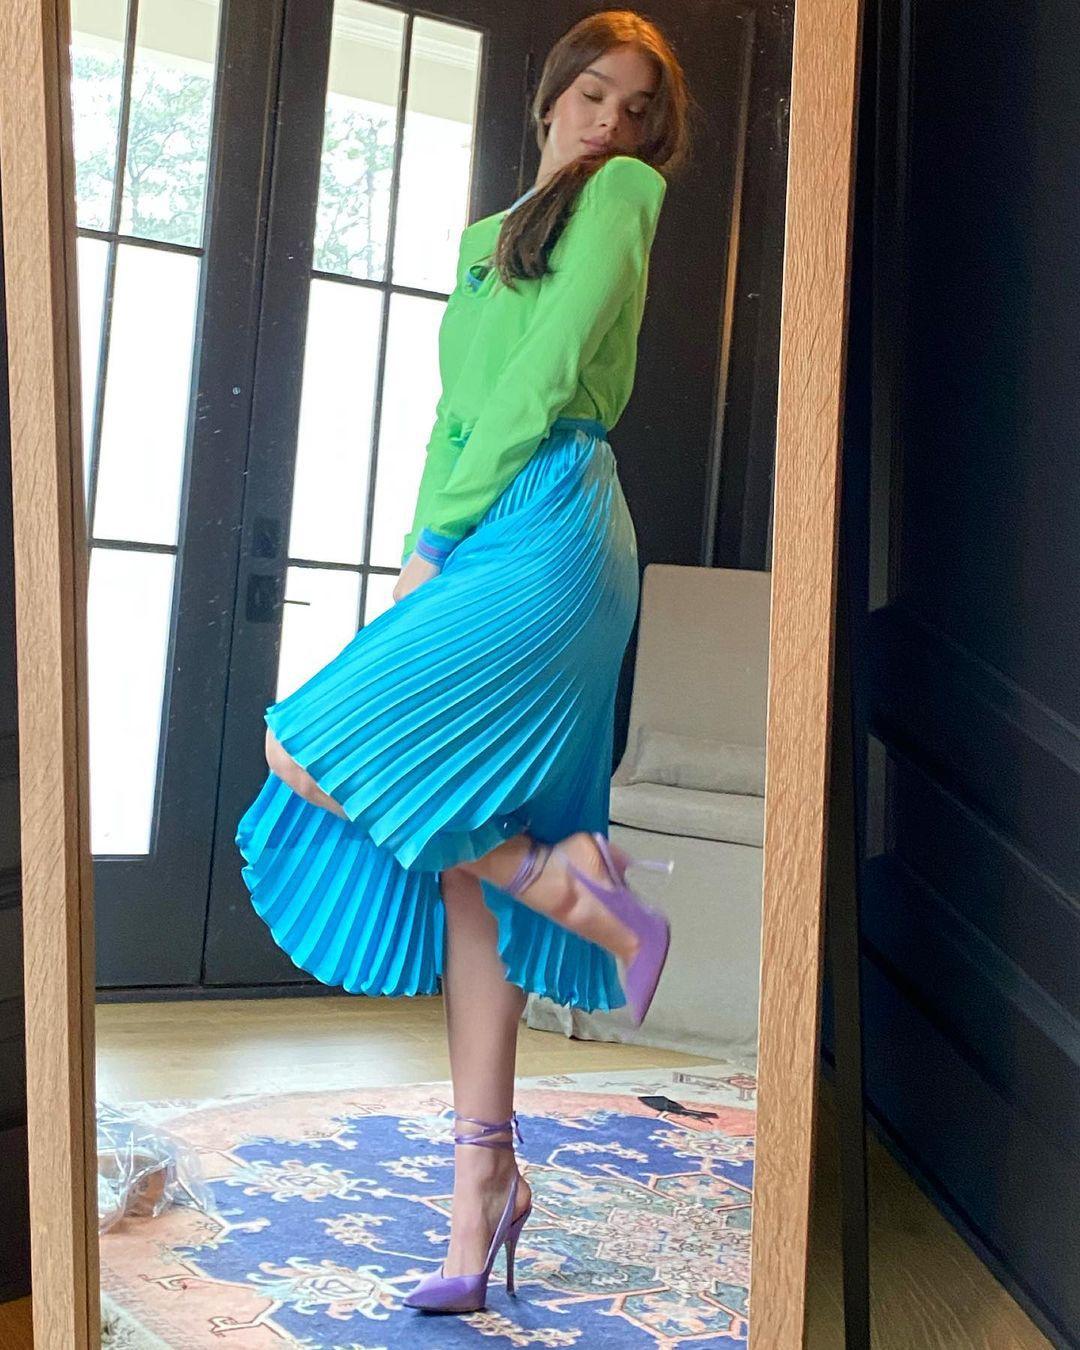 Hailee Steinfeld Sexy In Skirt